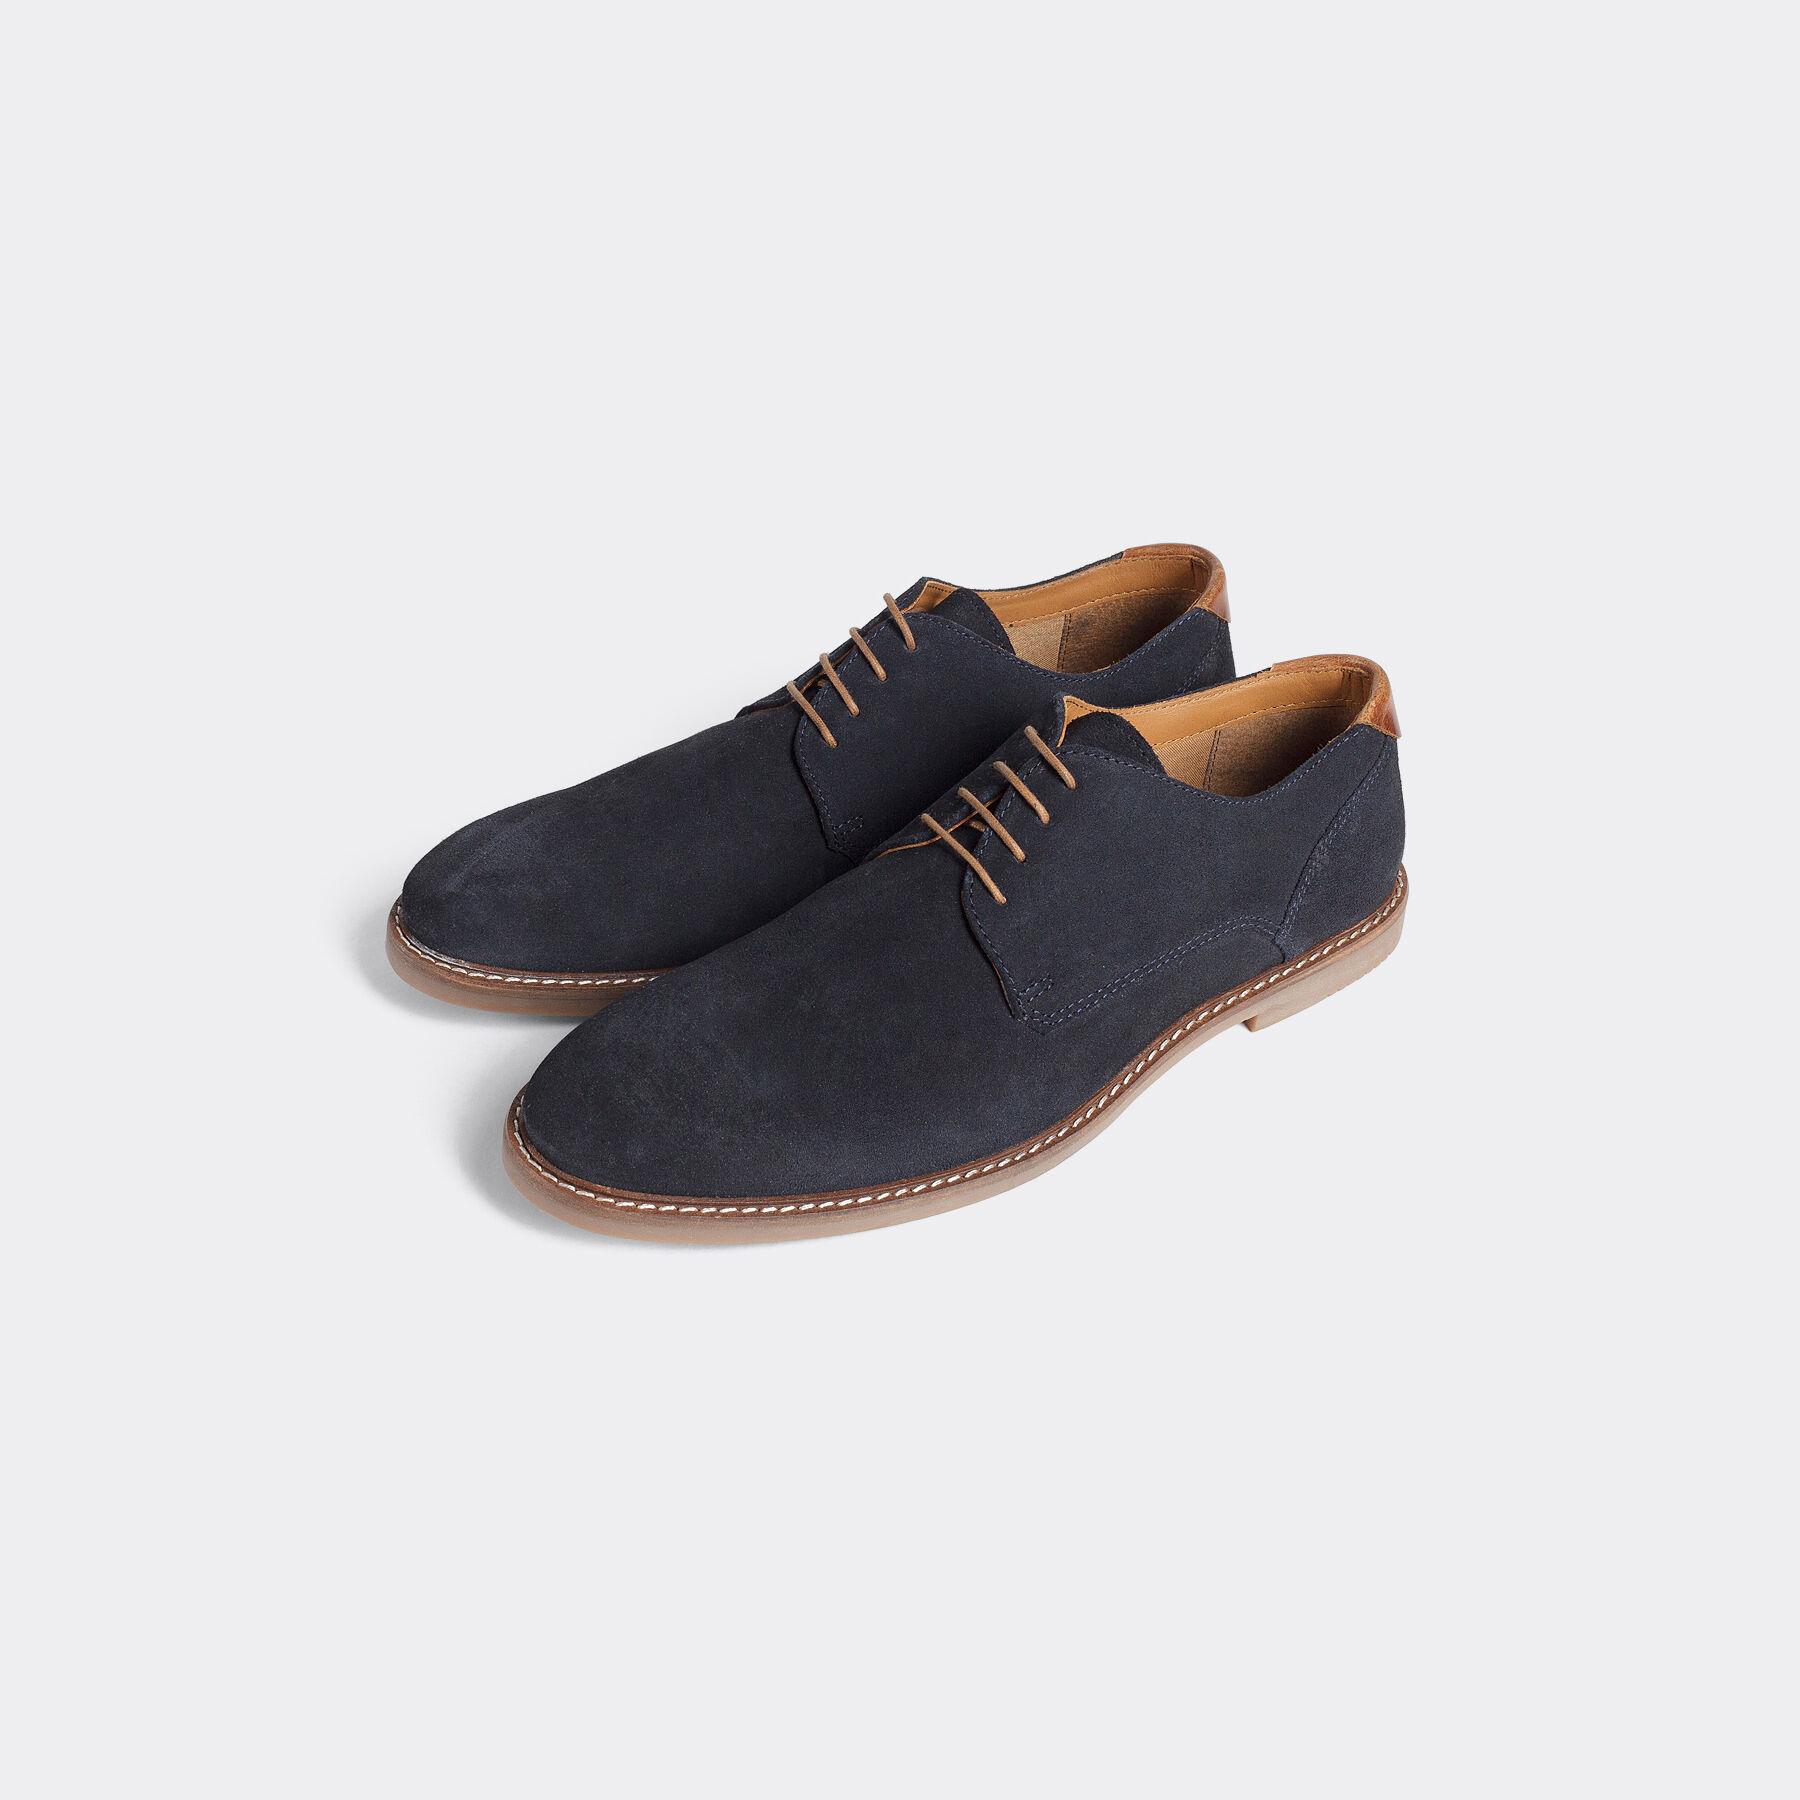 chaussure semelle bleu,Image 2 Nike Air Force 1 07 Baskets